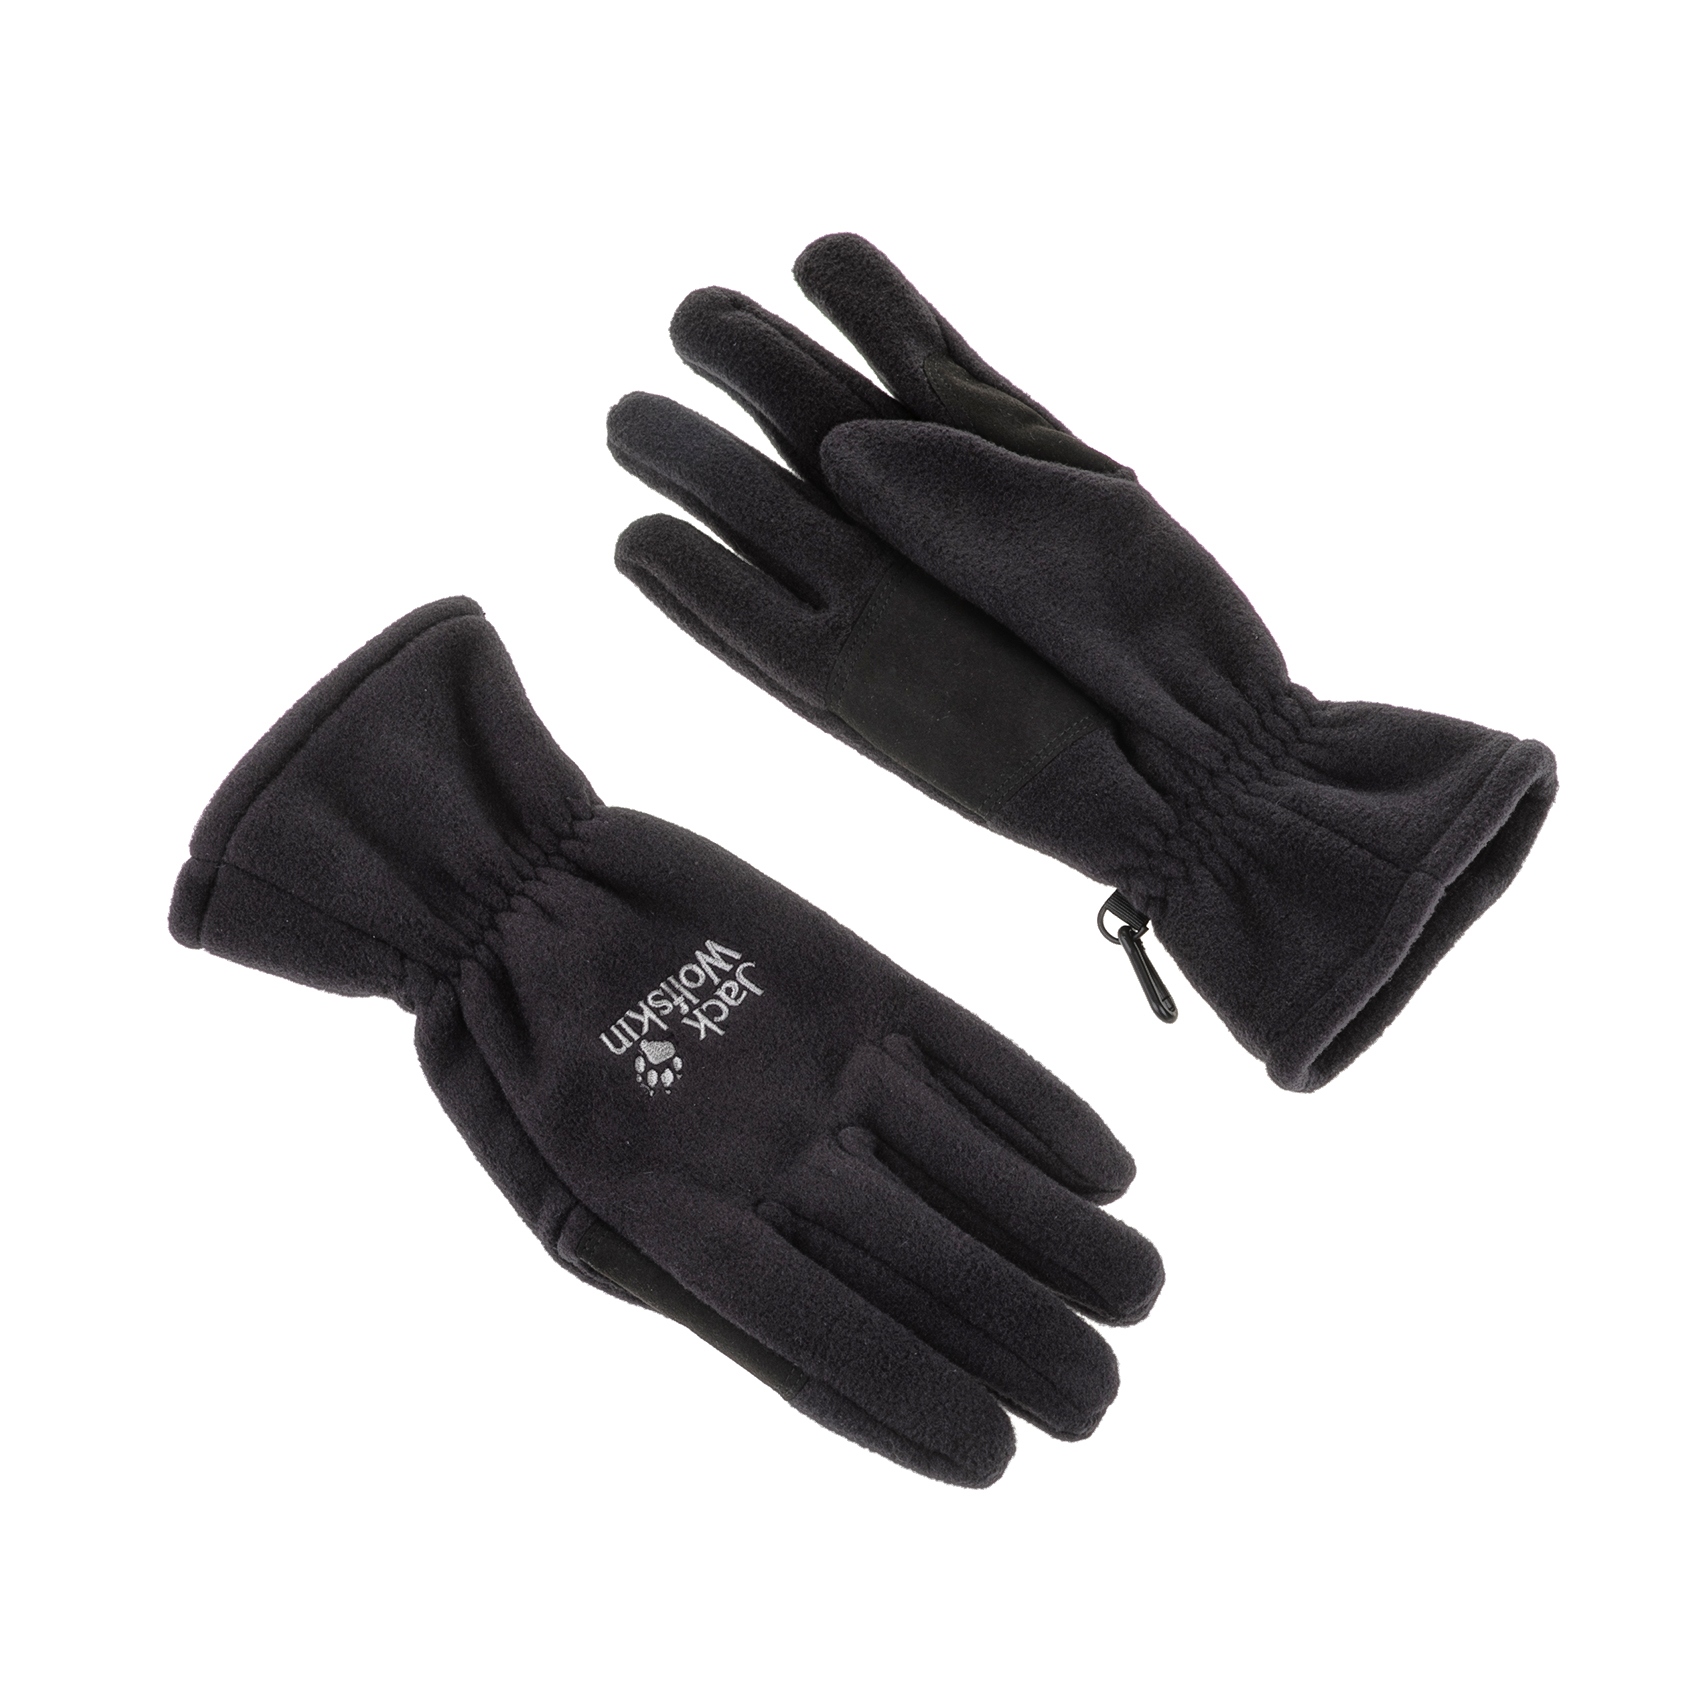 JACK WOLFSKIN - Unisex γάντια ARTIST GLOVE ΑΞΕΣΟΥΑΡ UNISEX μαύρα γυναικεία αξεσουάρ φουλάρια κασκόλ γάντια